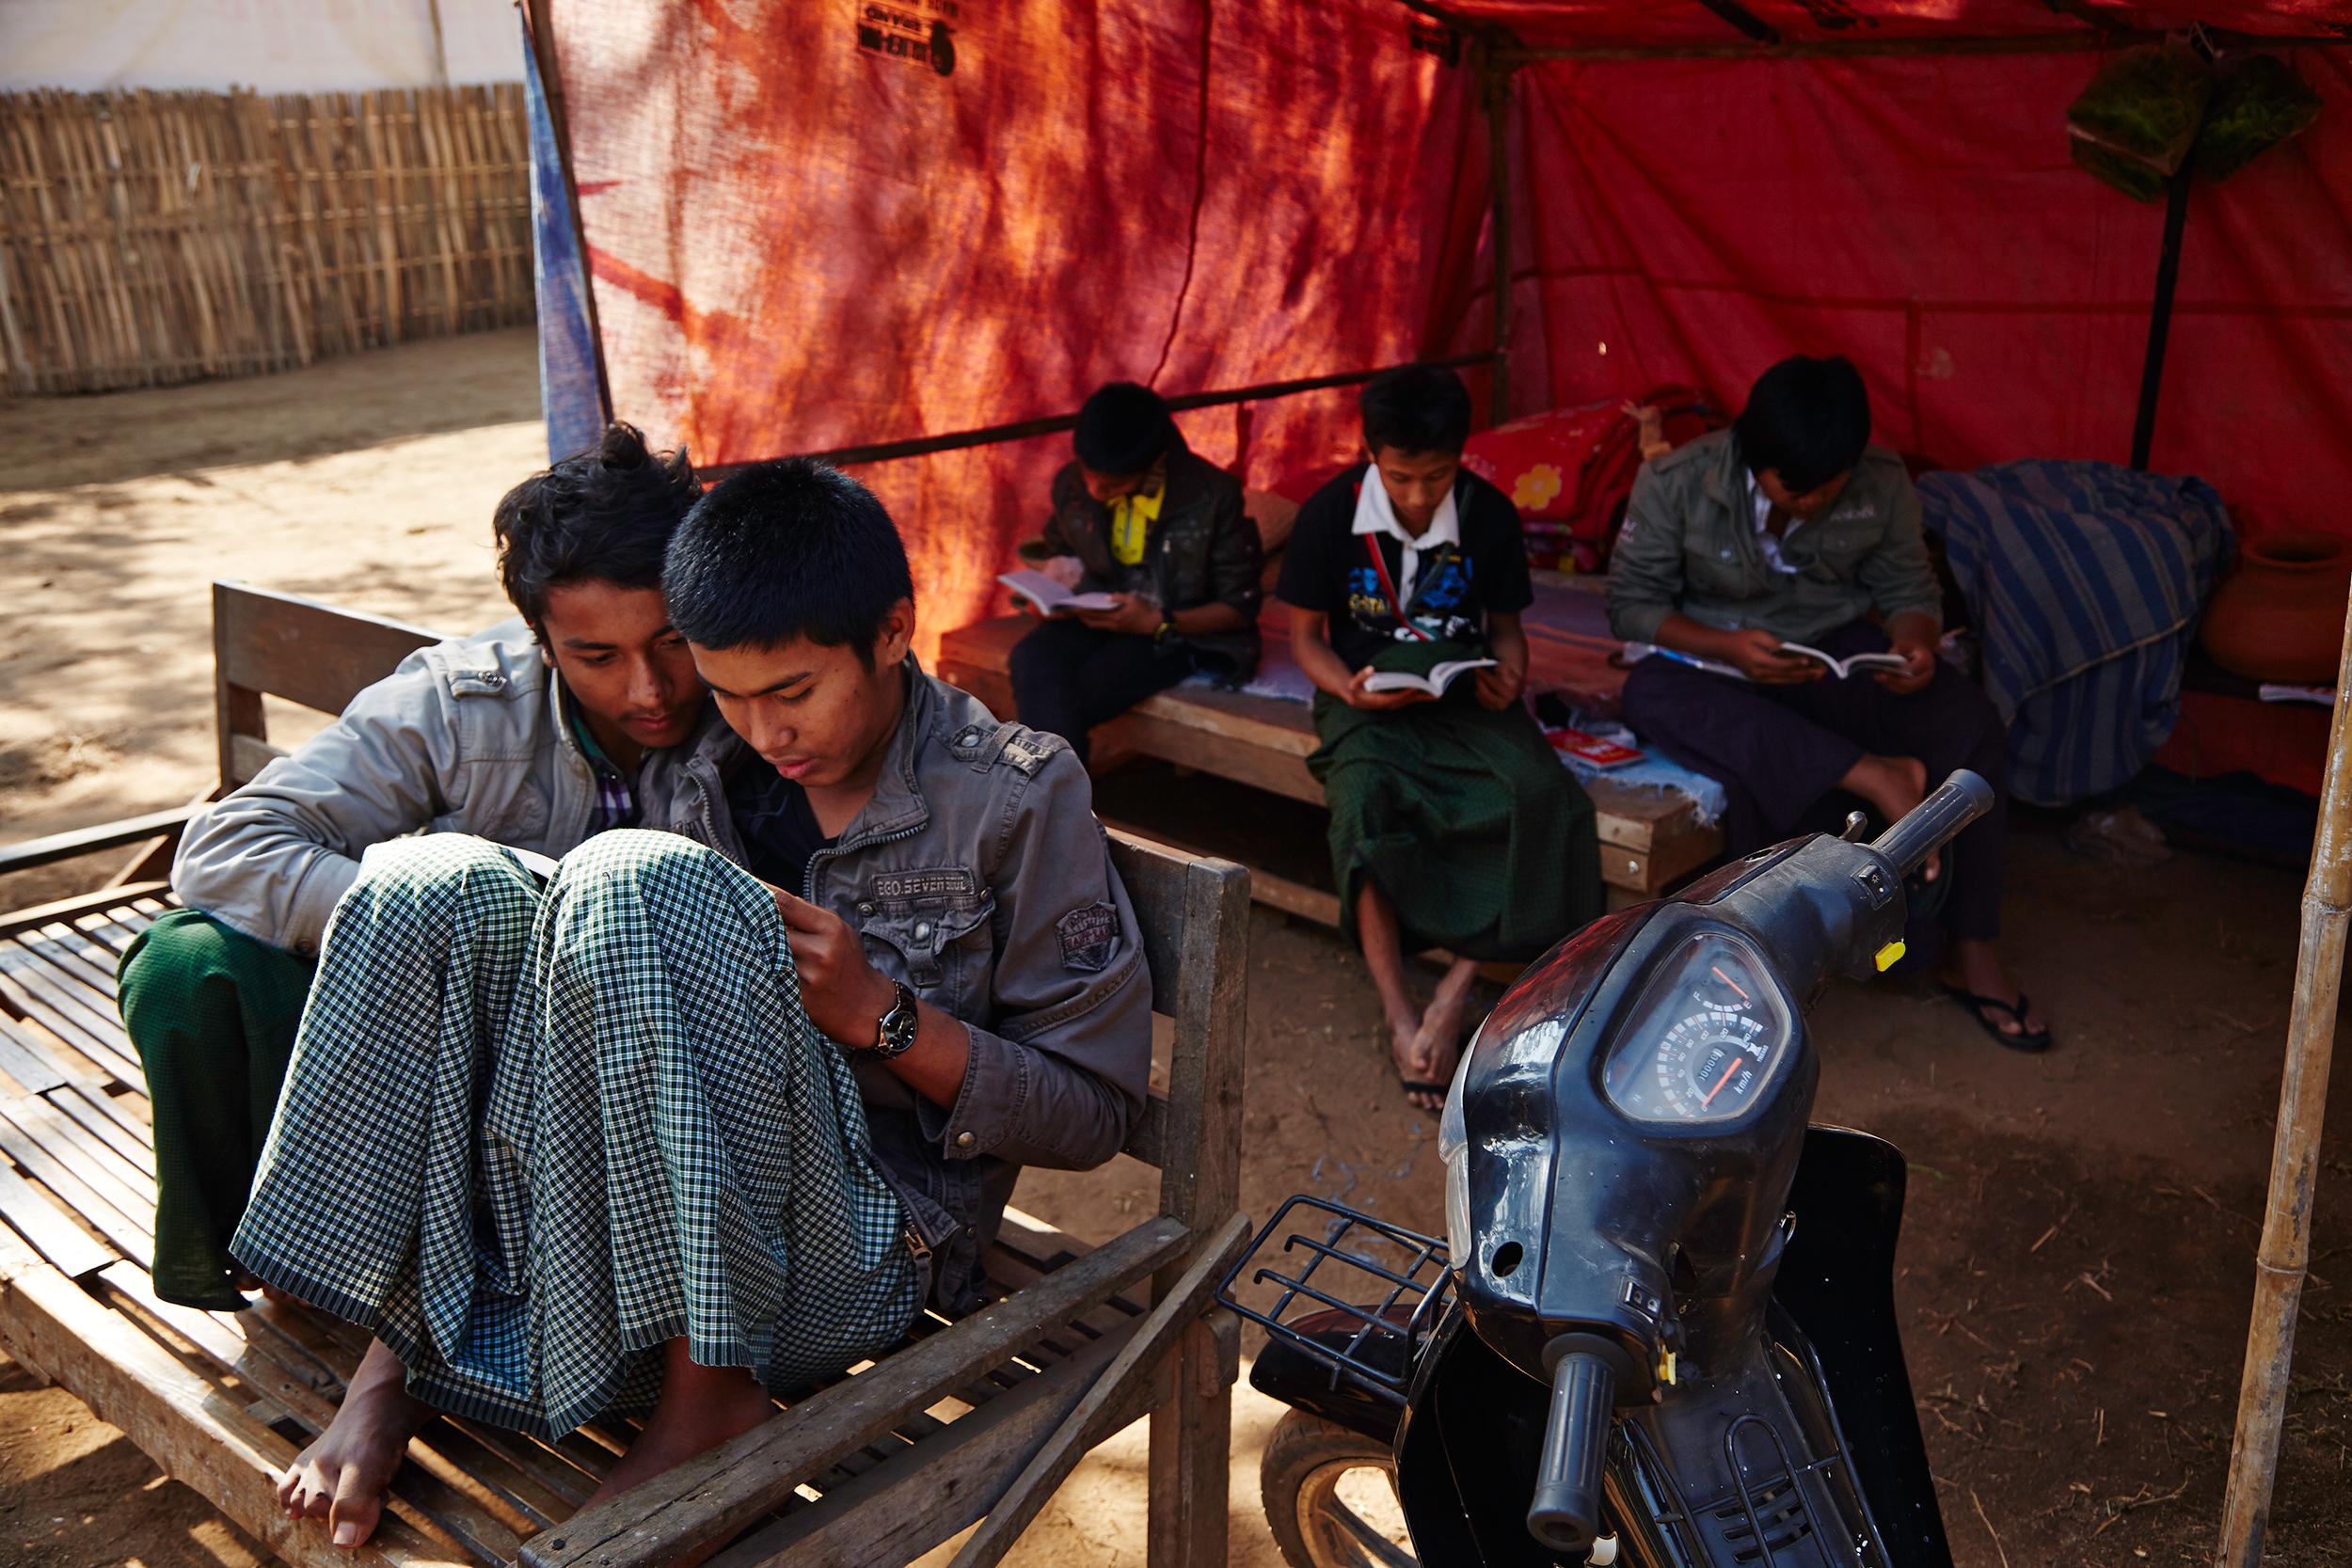 Kanjana-Chaiwatanachai-Image-Works_Bagan_2014.01.14_0097w.jpg